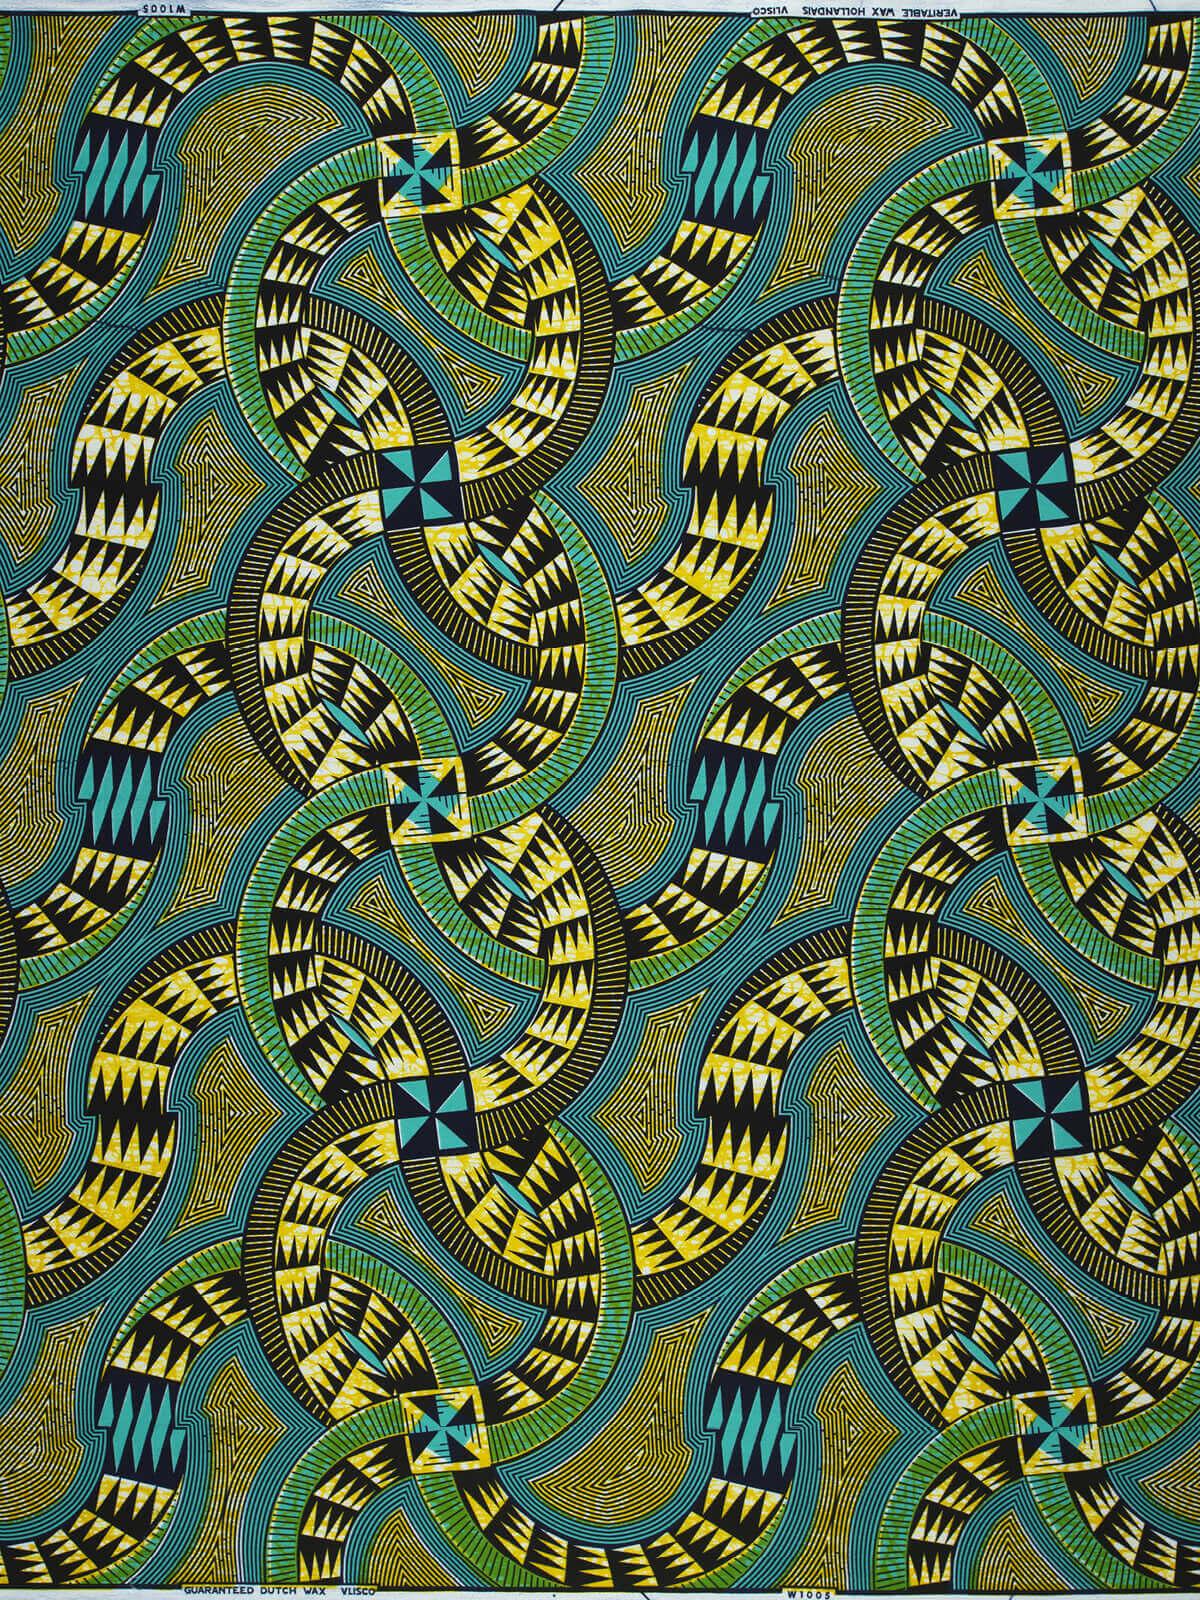 W31 Lookbook Fabric3 Vlw1005 001